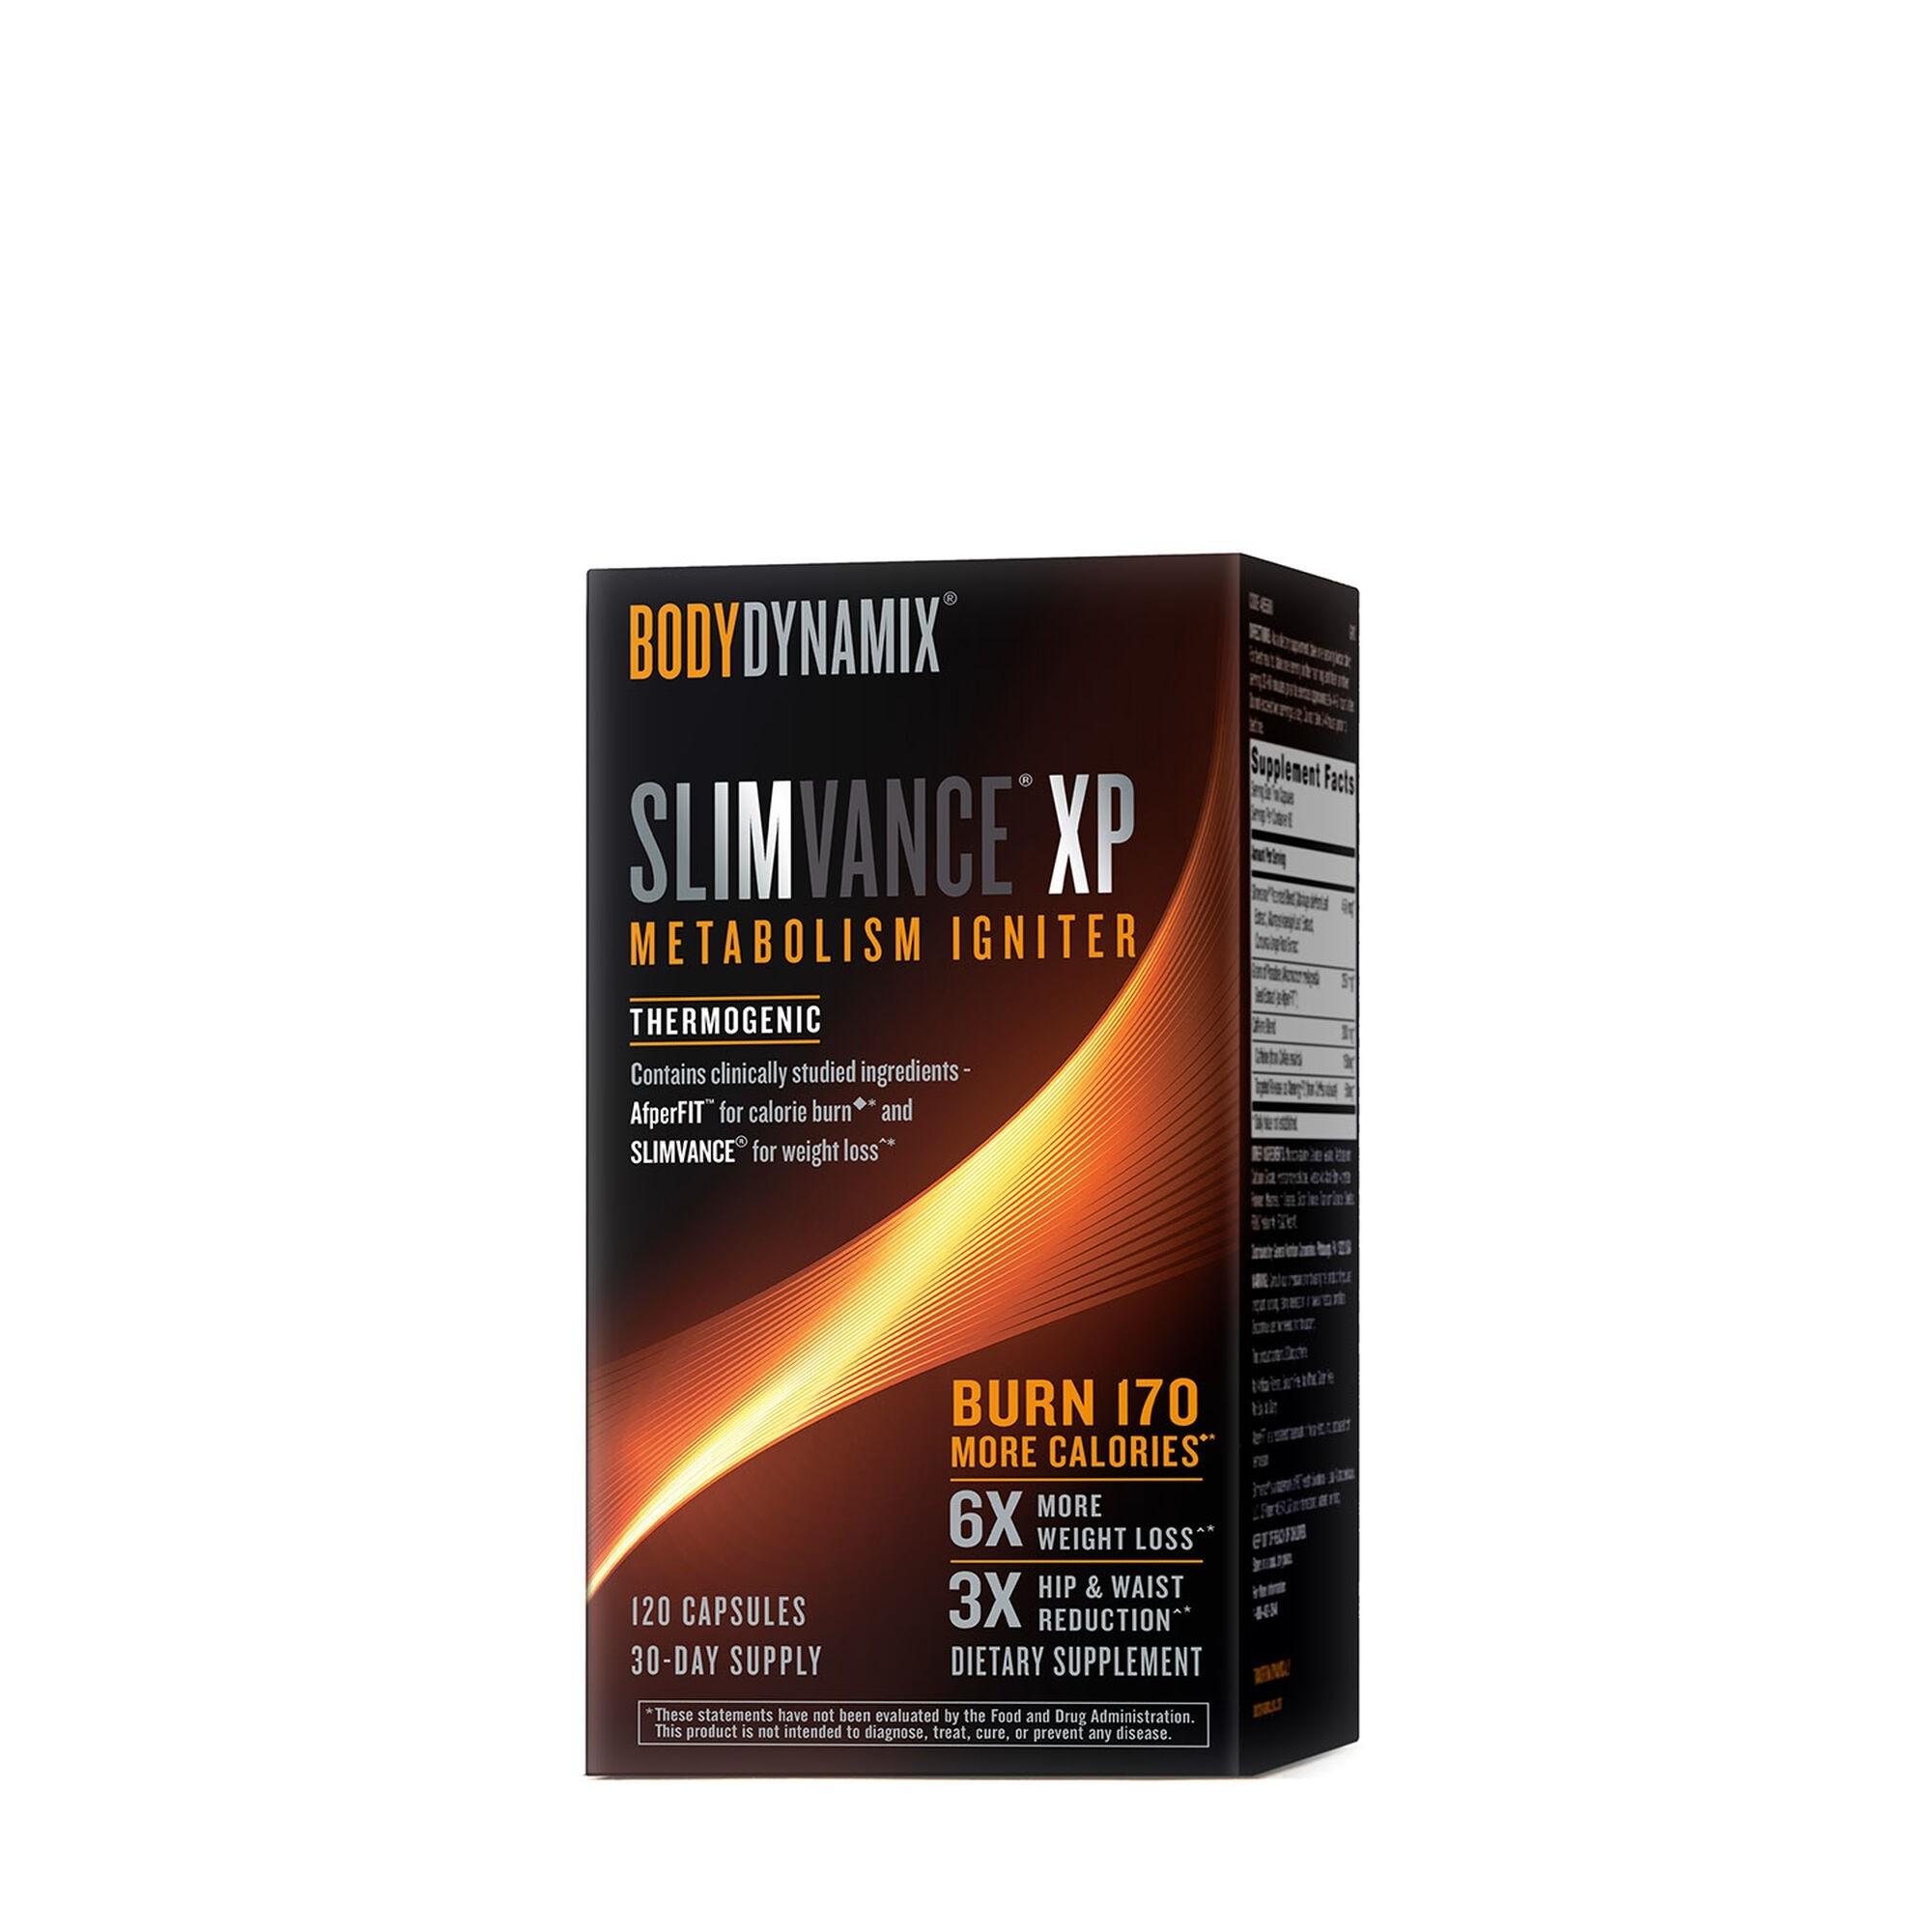 BodyDynamix® Slimvance® XP Metabolism Igniter, Termogenic, 120 cps